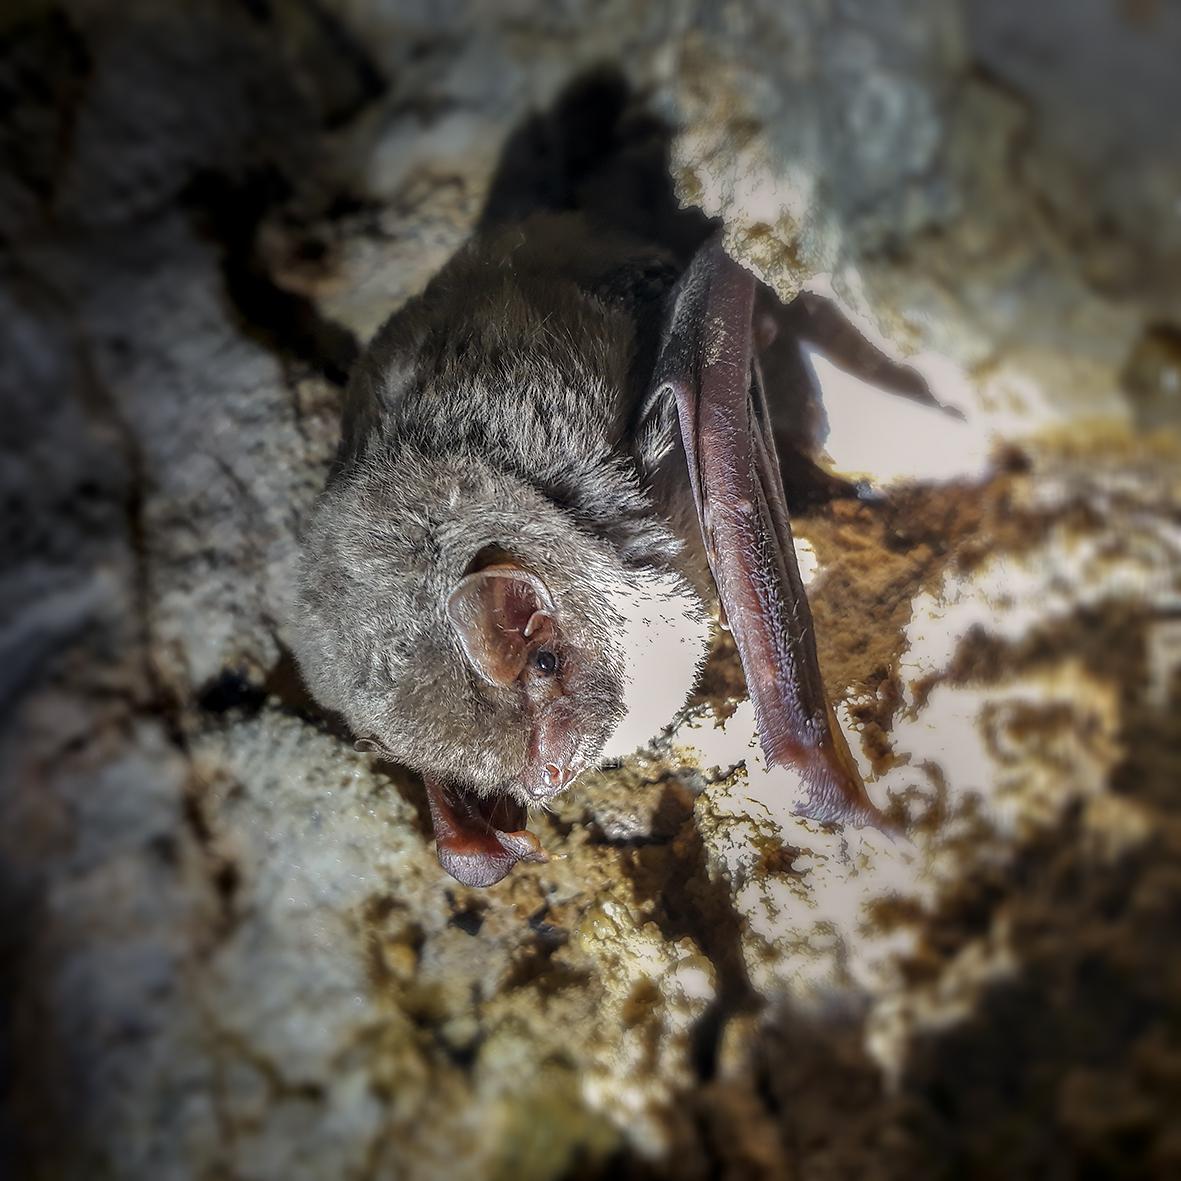 Schreibers' bat (Miniopterus schreibersii) (Photo: Bernd-Jan Bulsink)